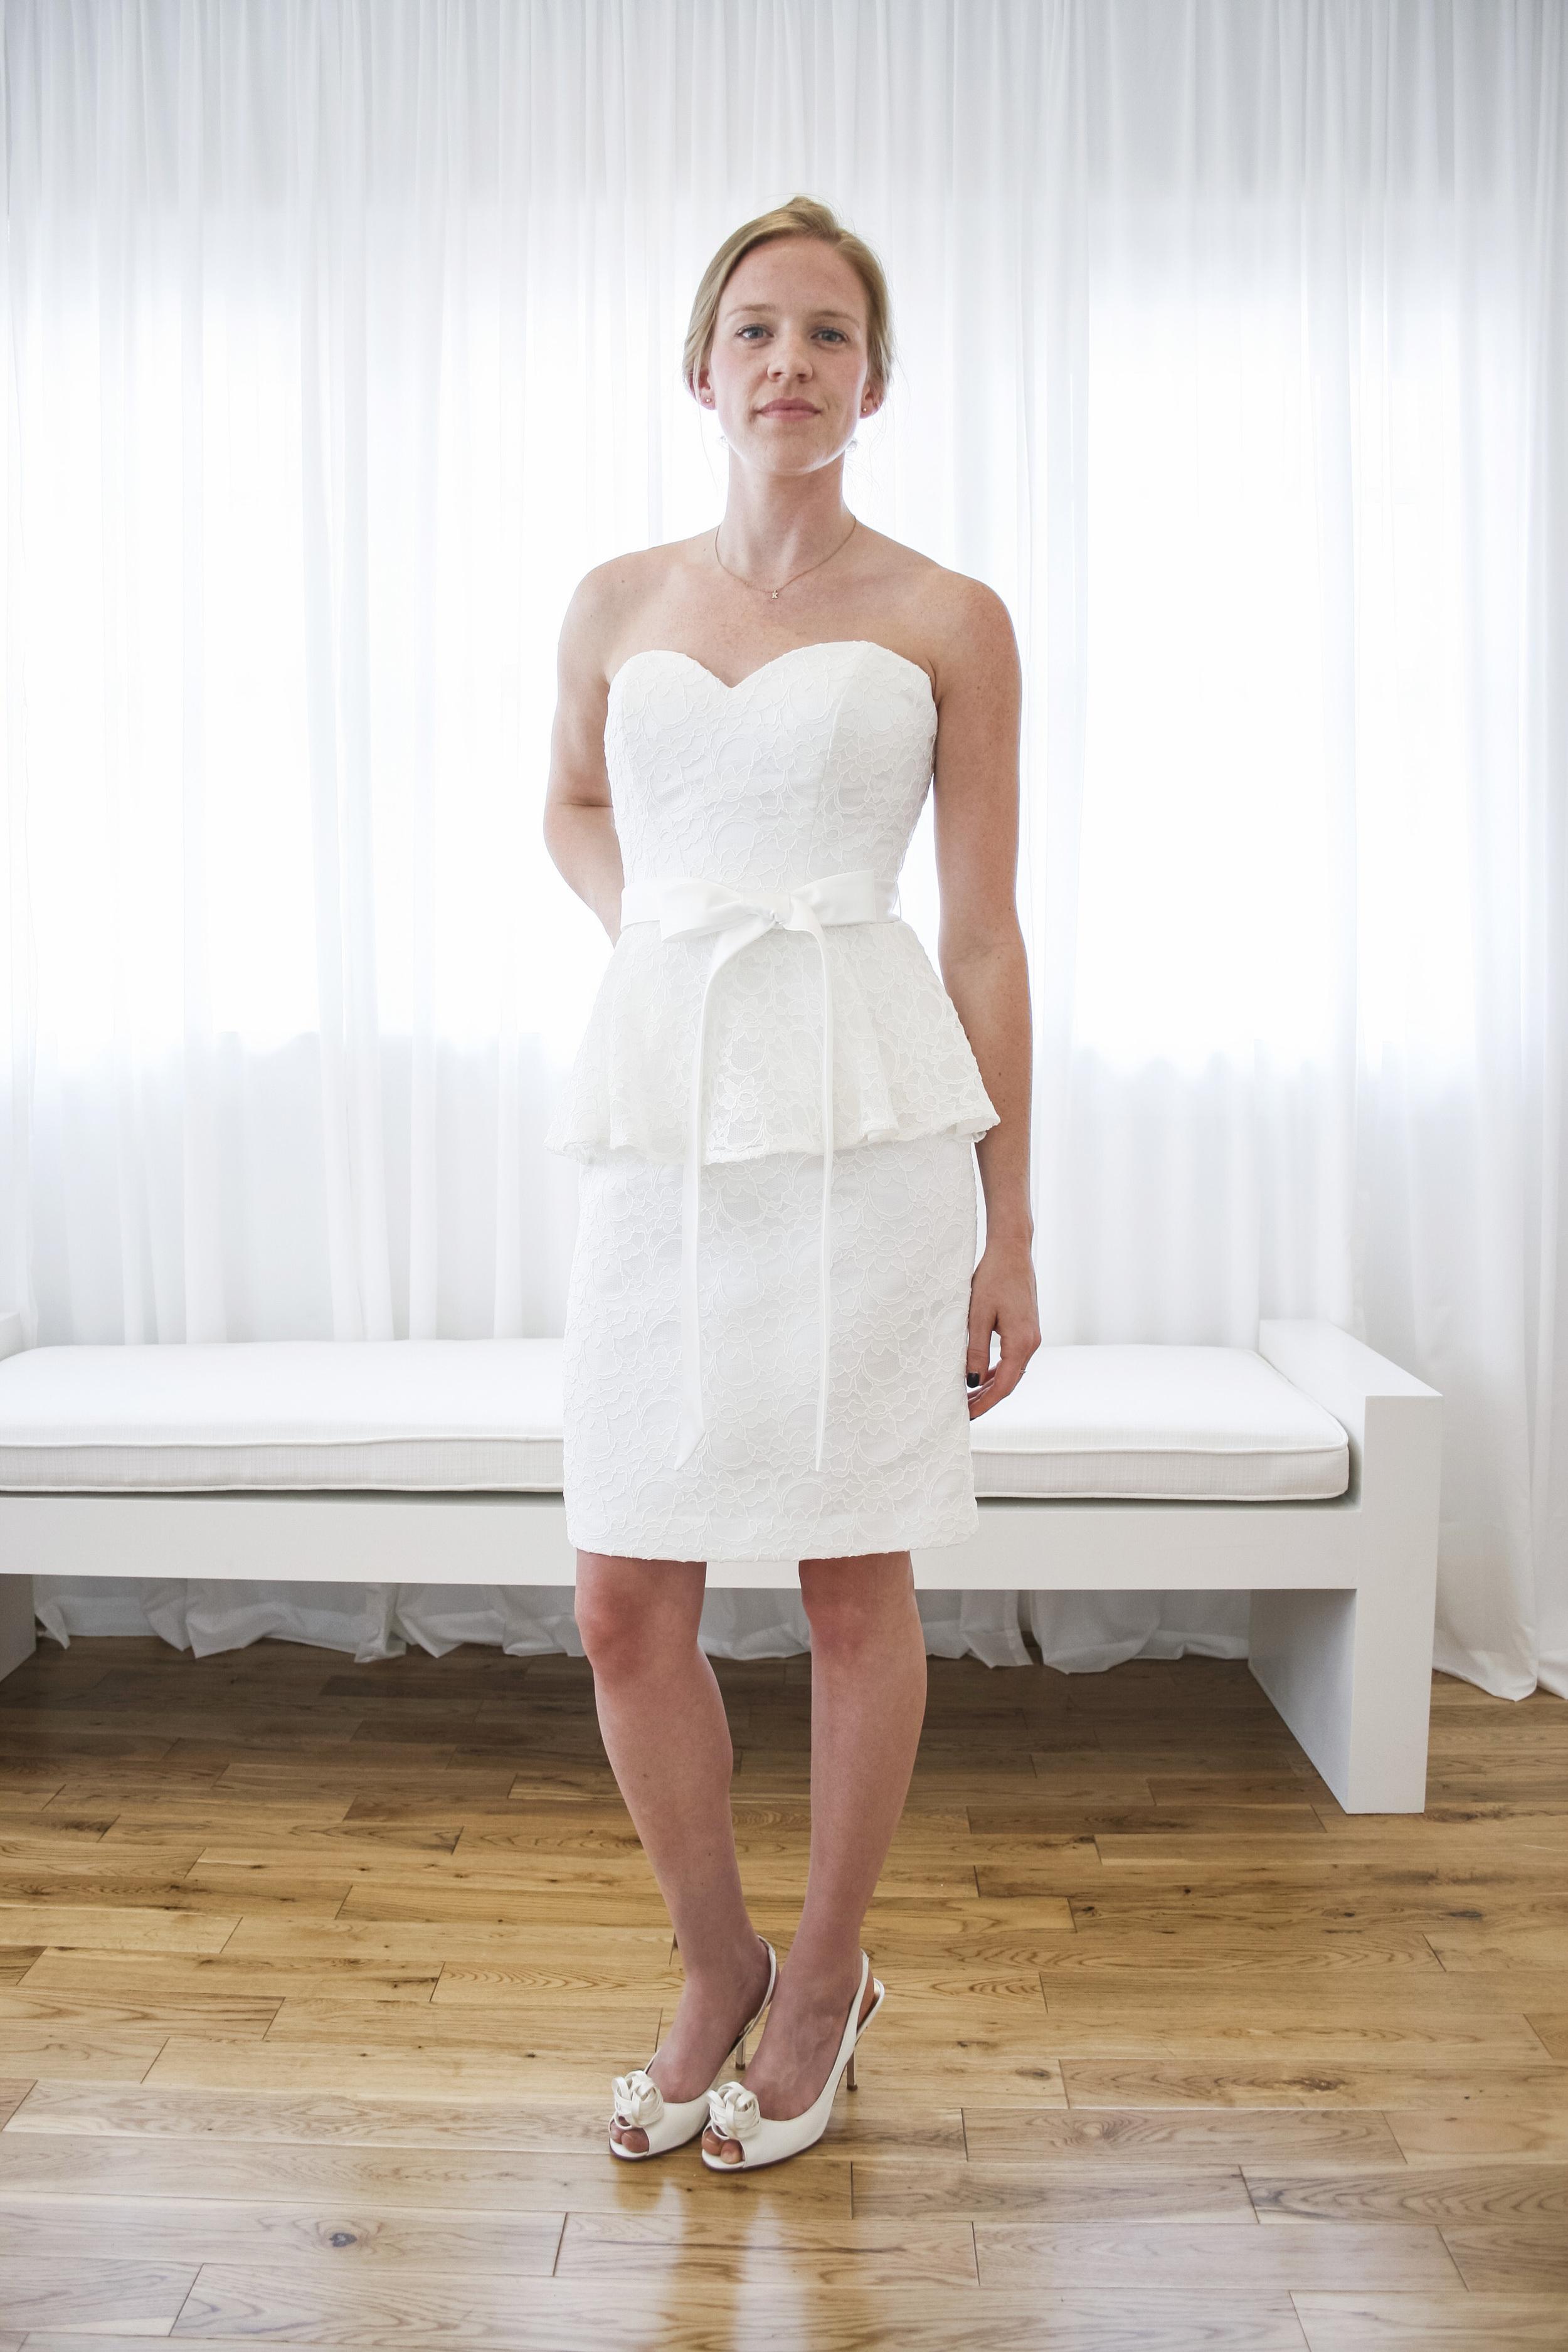 Designer Wedding Dresses Bustle Wedding Dresses And Gowns Blog In Birmingham Al